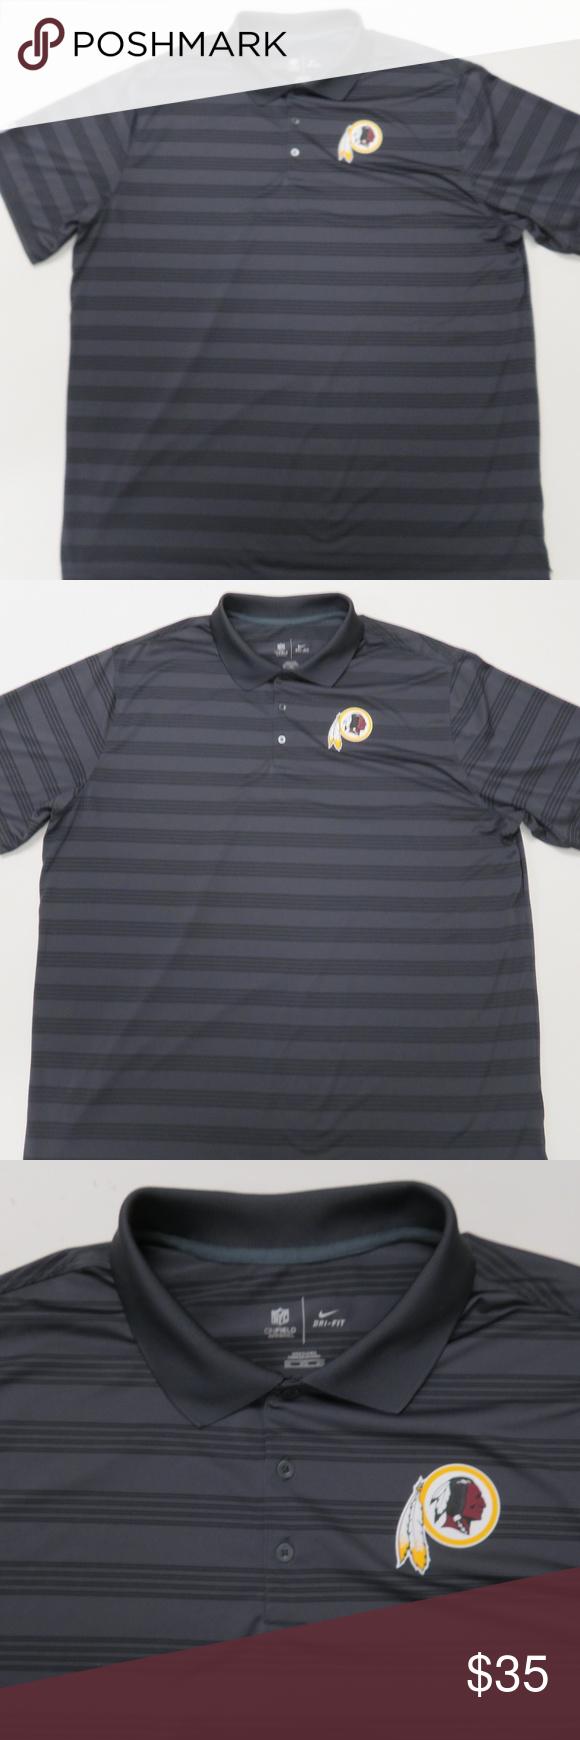 detailed look c128c 0fbbc Nike Washington Redskins Polo Shirt Mens 3XL Gray Torrid women s size 2 gray  marled pullover hoodie